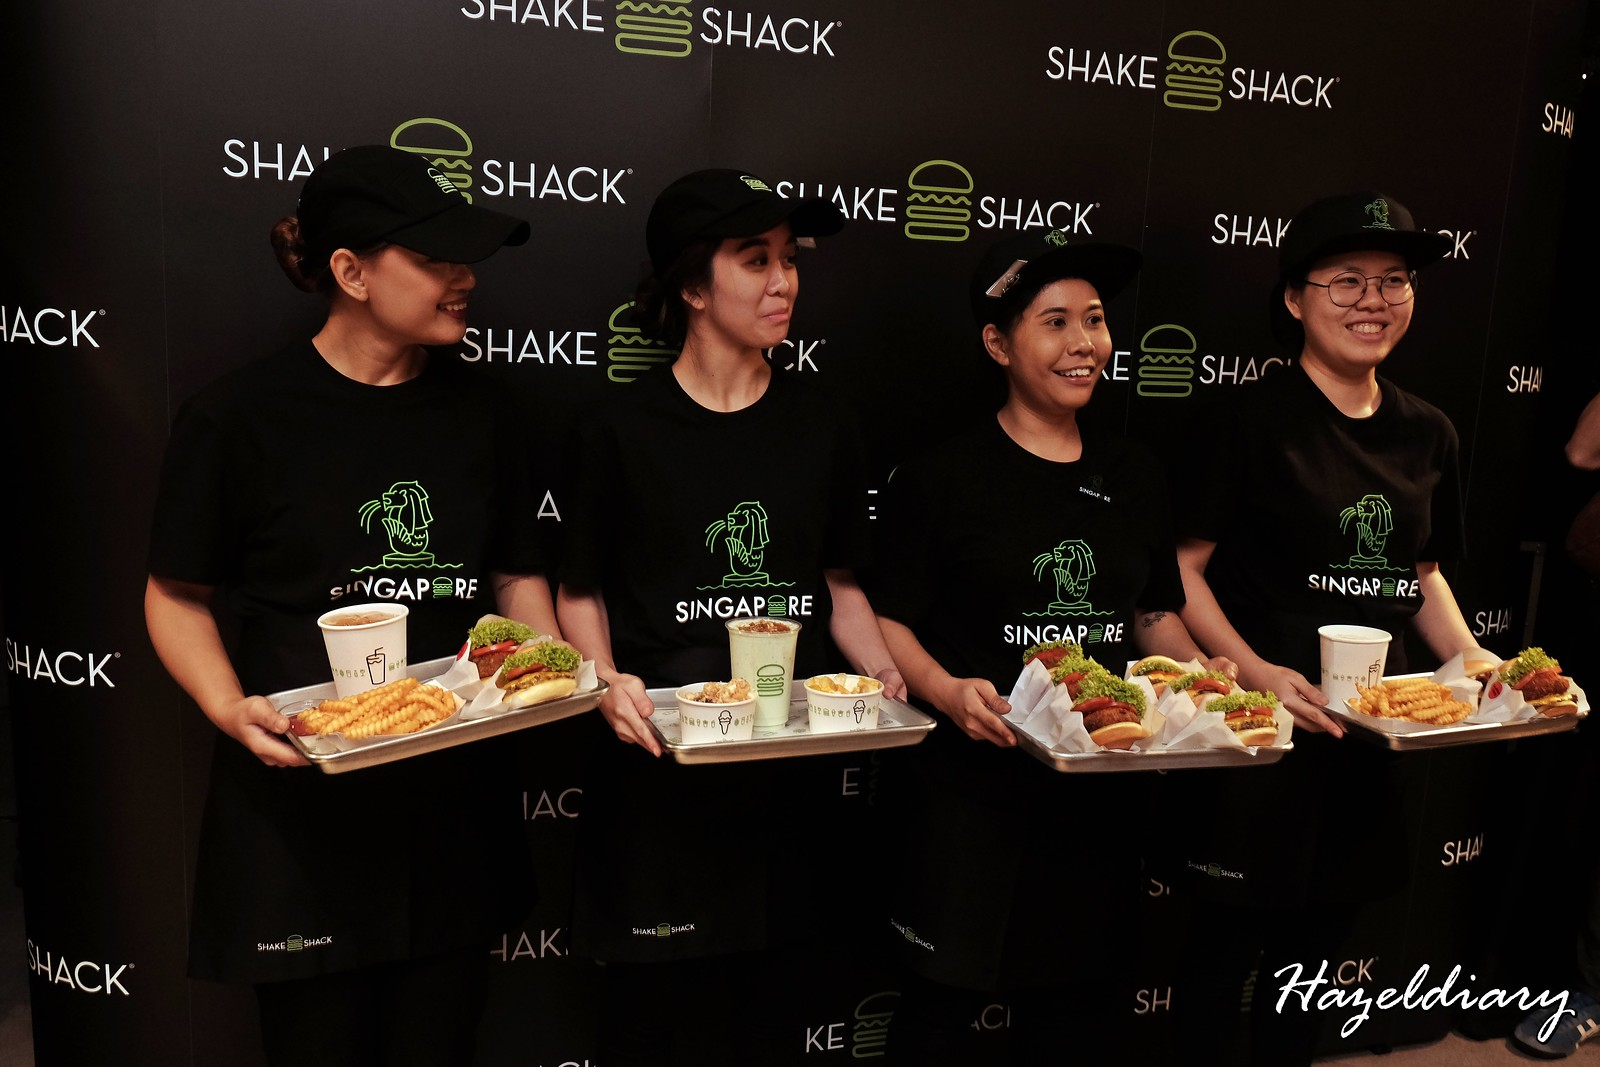 Shack Shack Singapore-Jewel Changi Airport